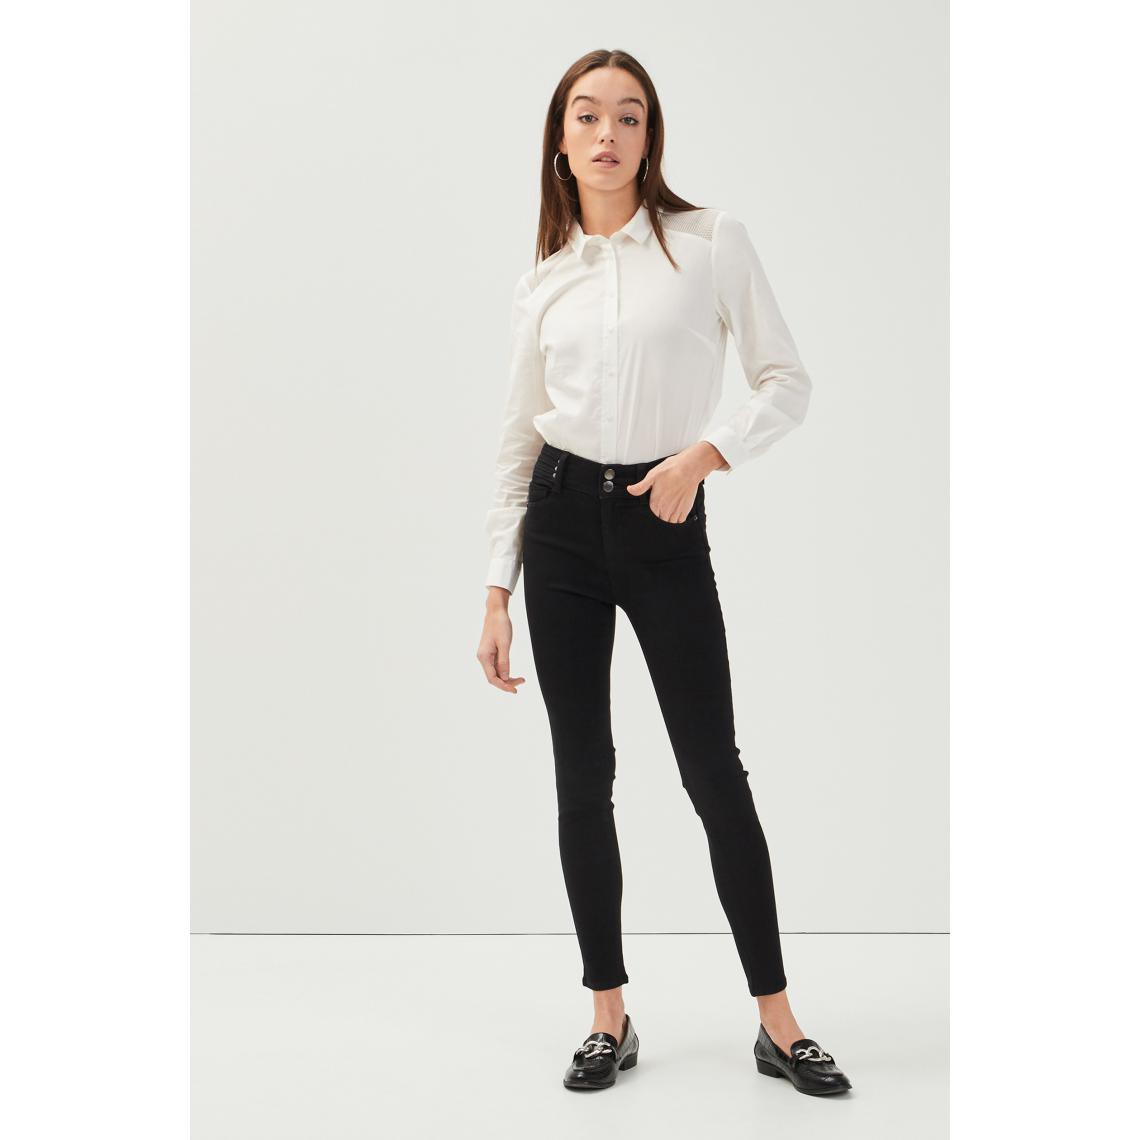 Jeans skinny détails rivets 7Hppv